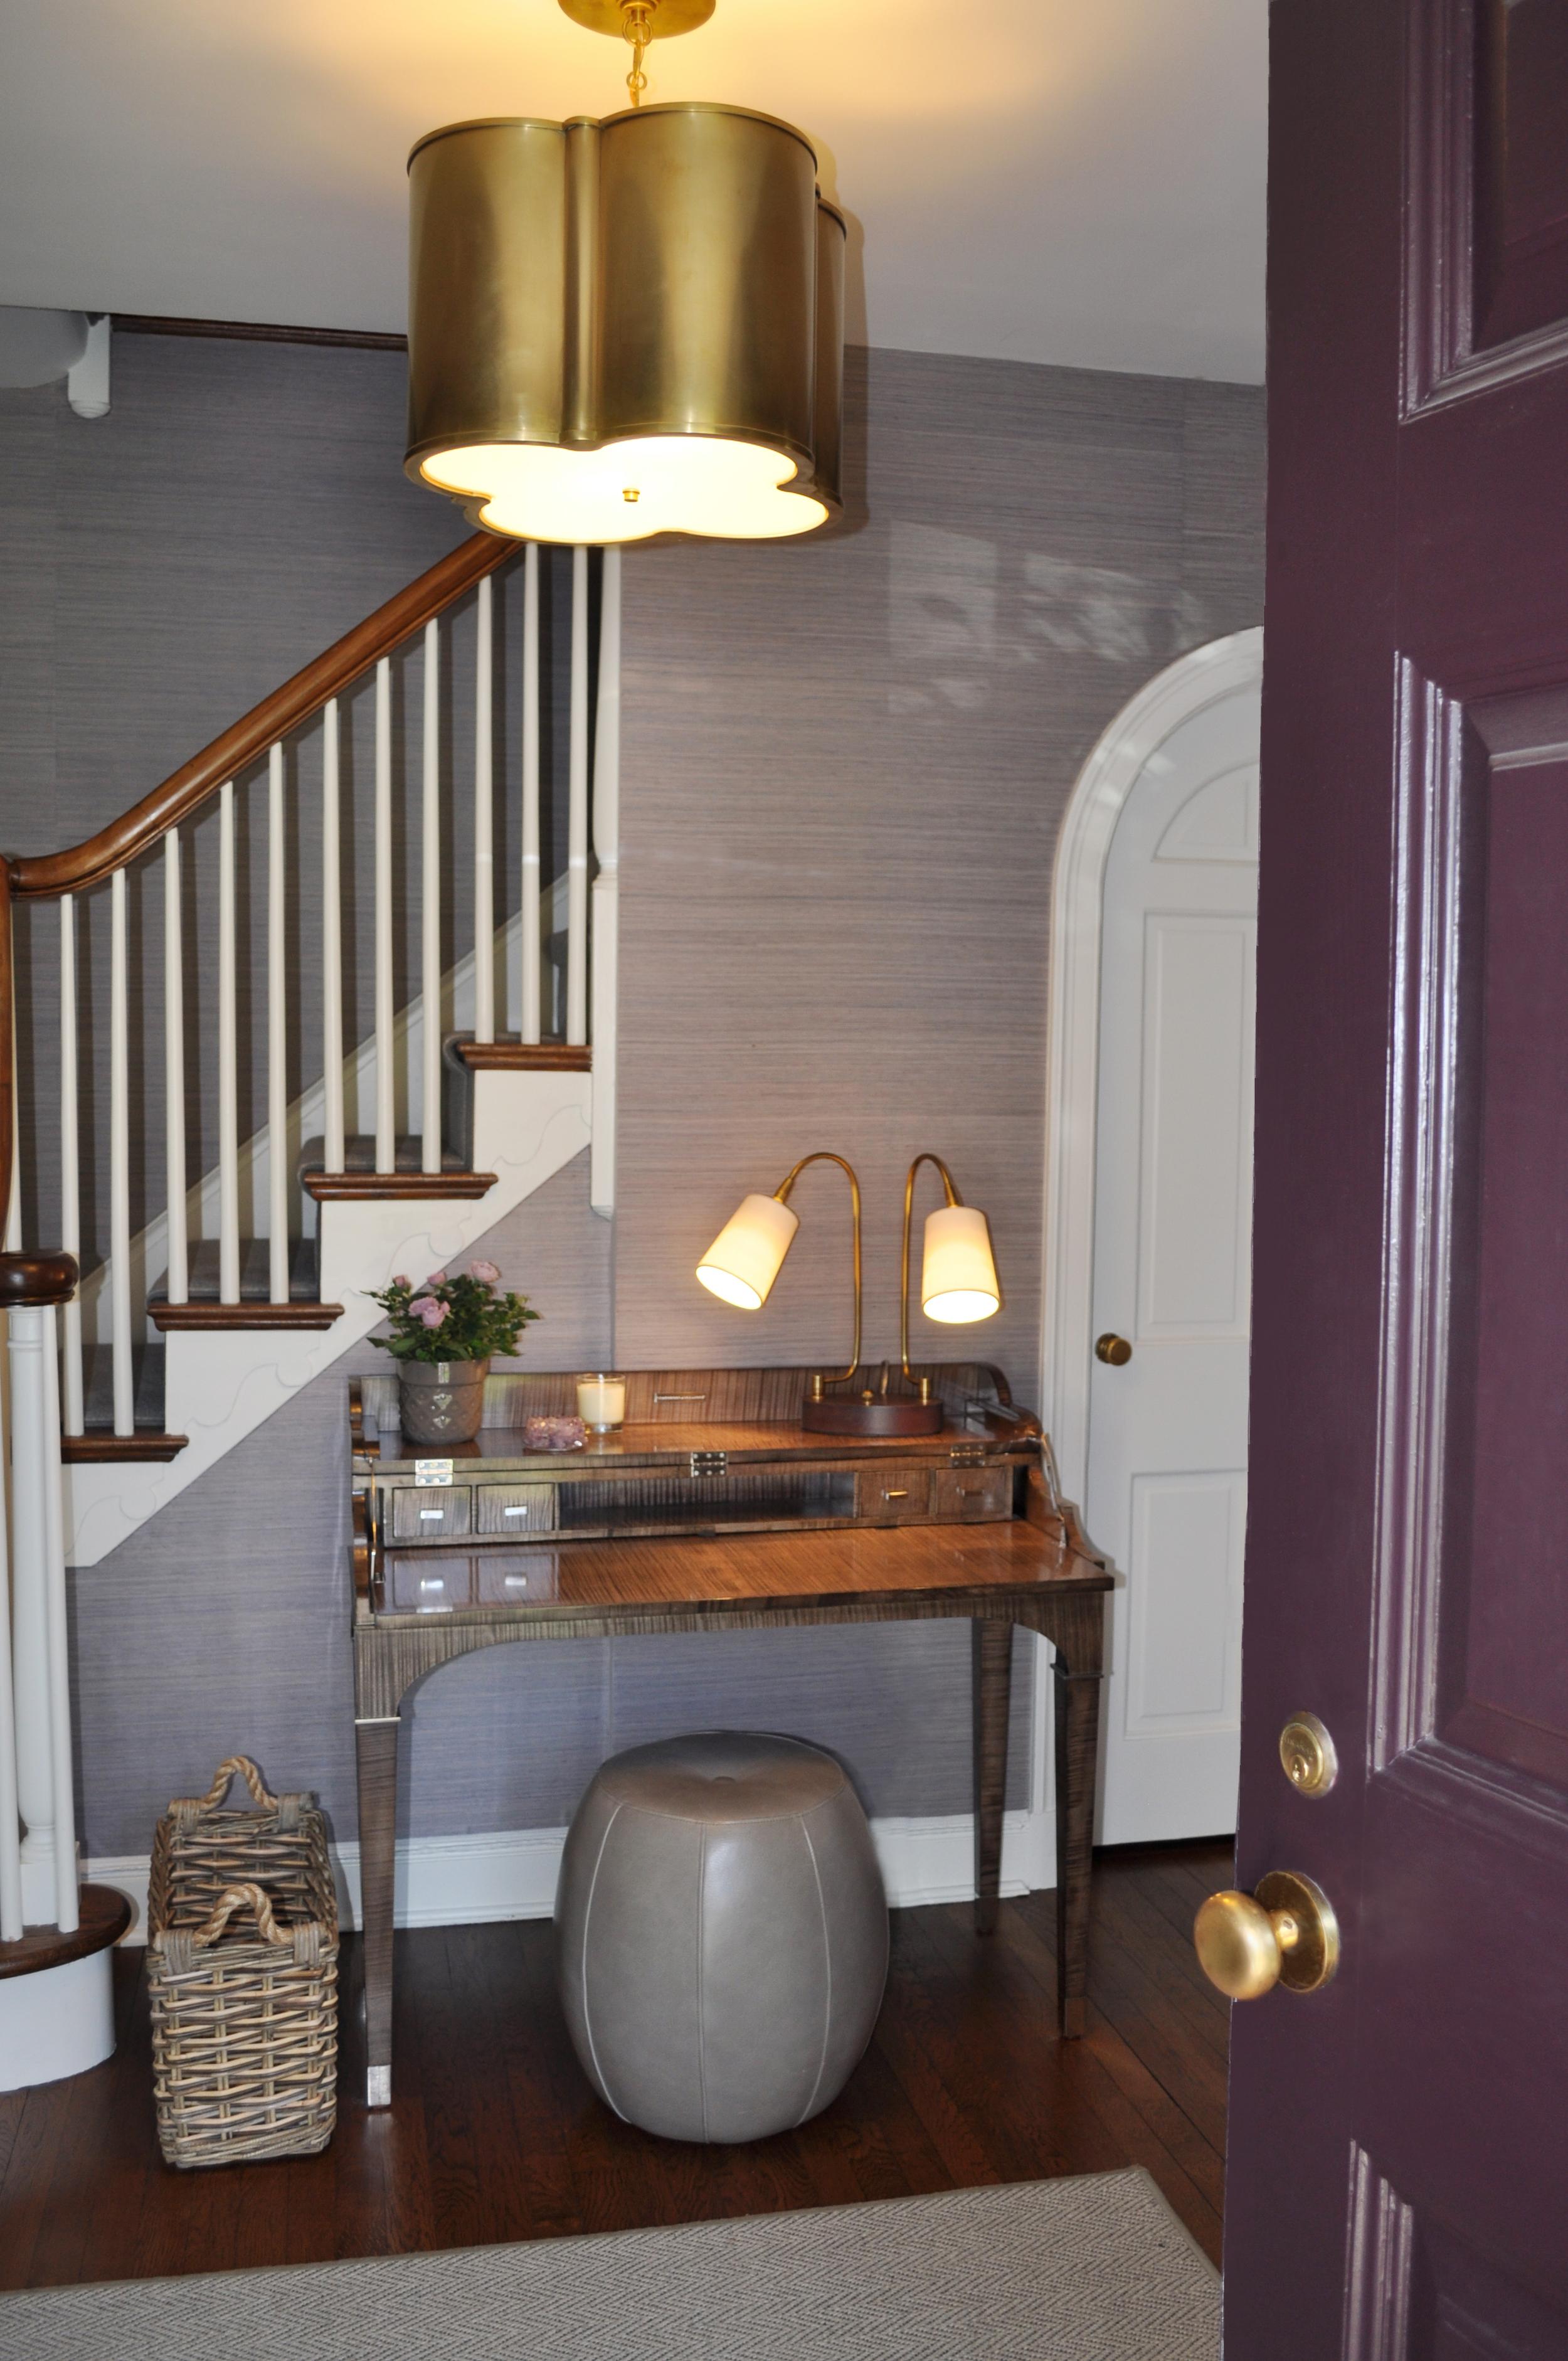 Foyer_Plum Front Door_Phillip Jeffries Hudson Haze Grasscloth Wallcovering_Entry Desk_Ballard Design Leather Pouf_Interior Designer Kim A Mitchell_KAM DESIGN_2016.jpg